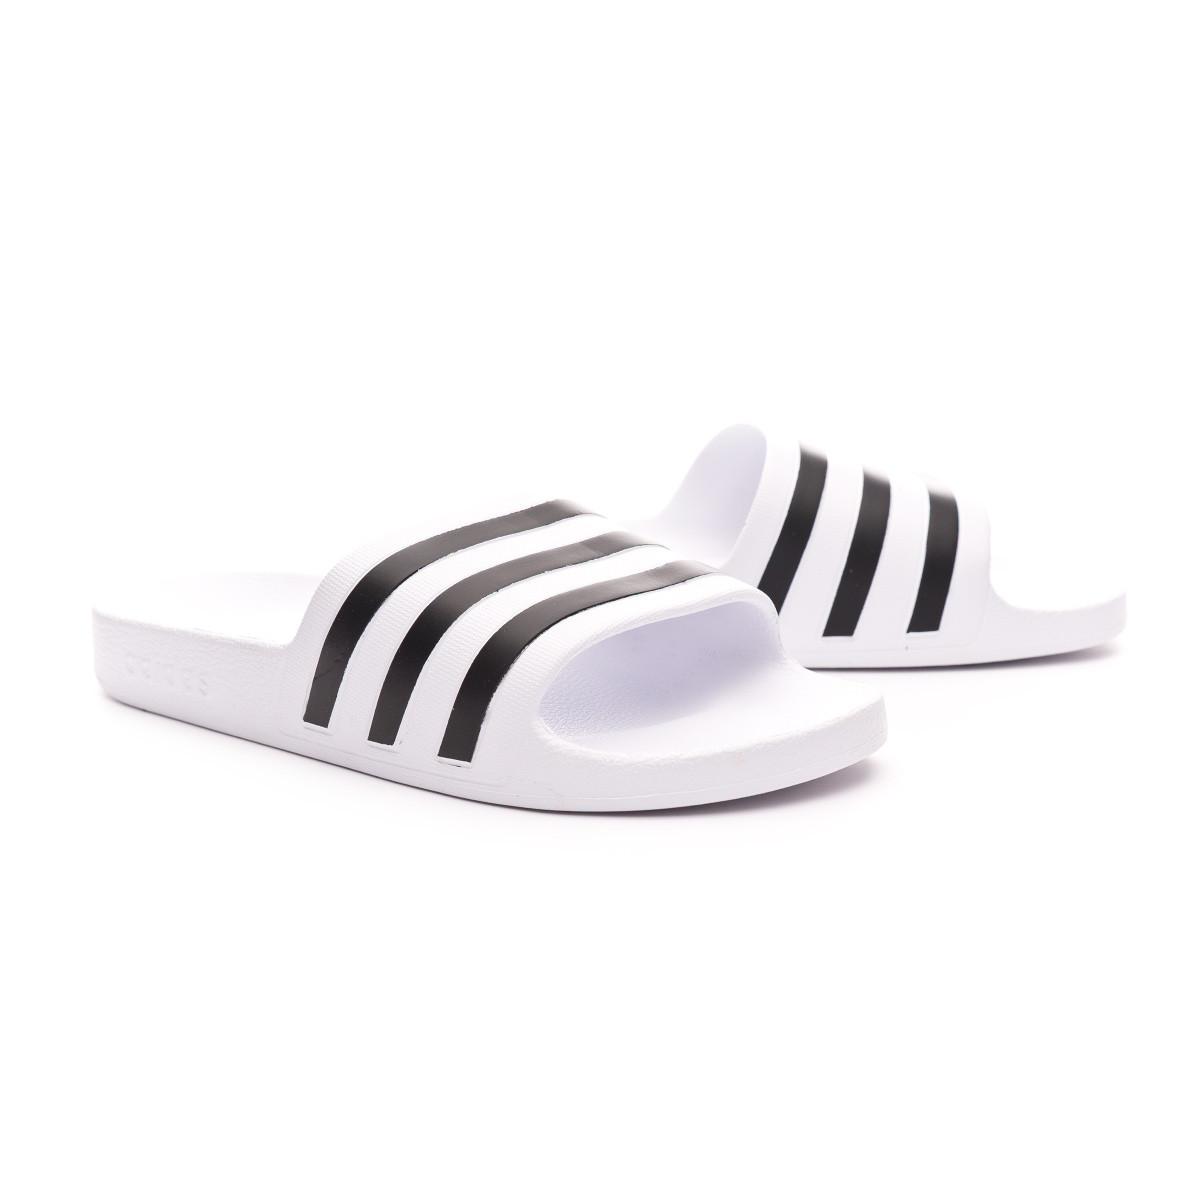 Flip-flops adidas Adilette Aqua White